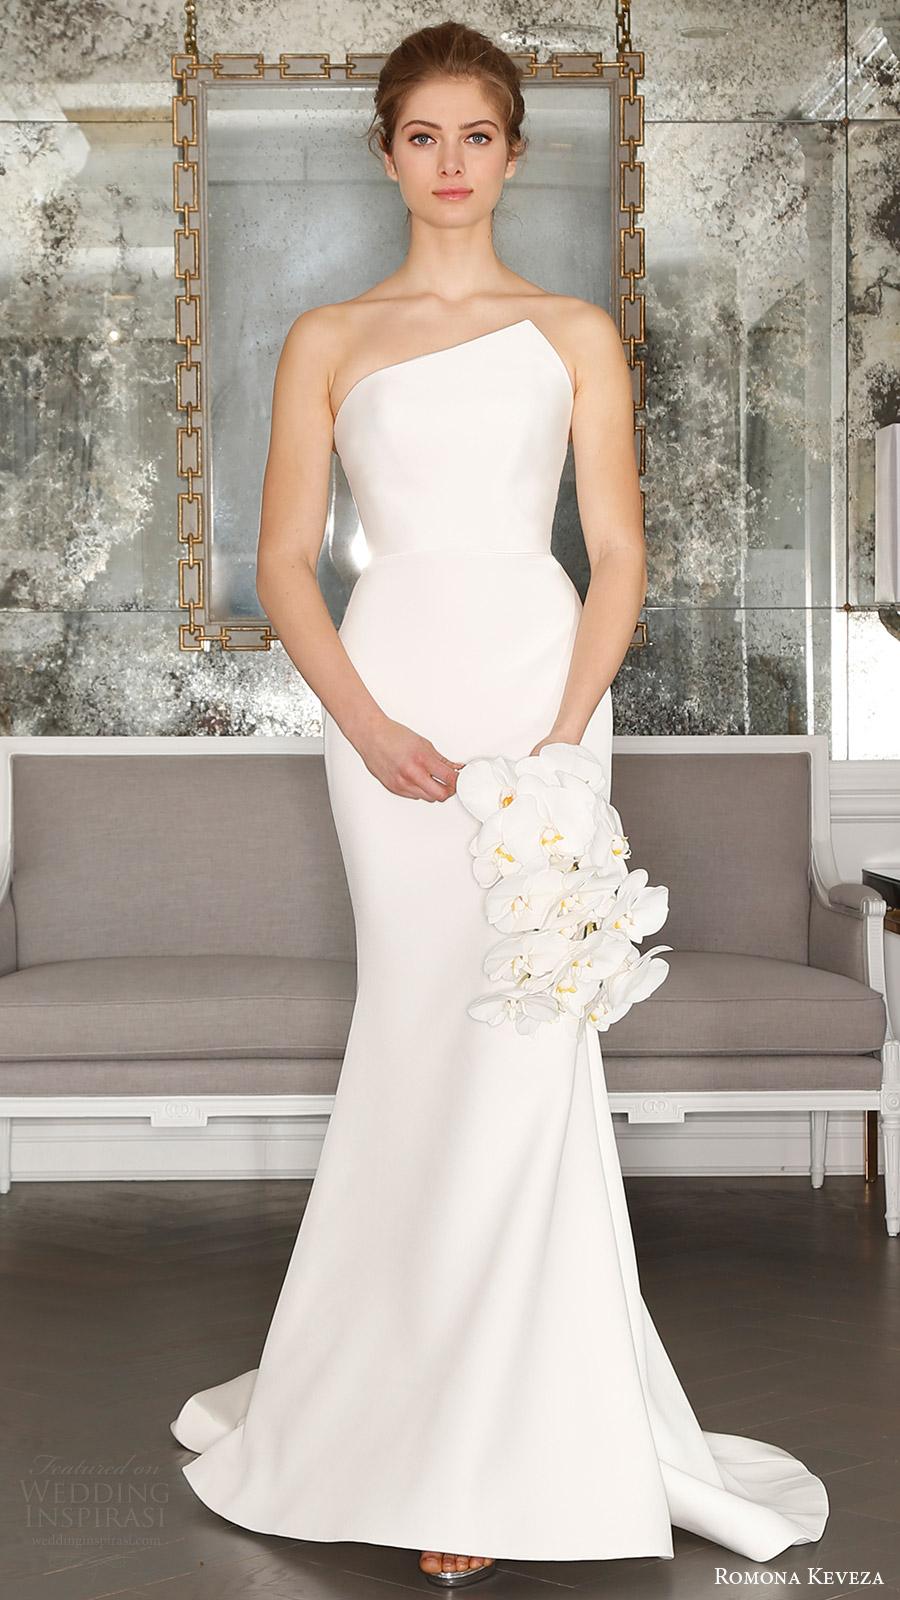 romona keveza bridal spring 2017 strapless asymmetric neck trumpet wedding dress (rk7403) mv